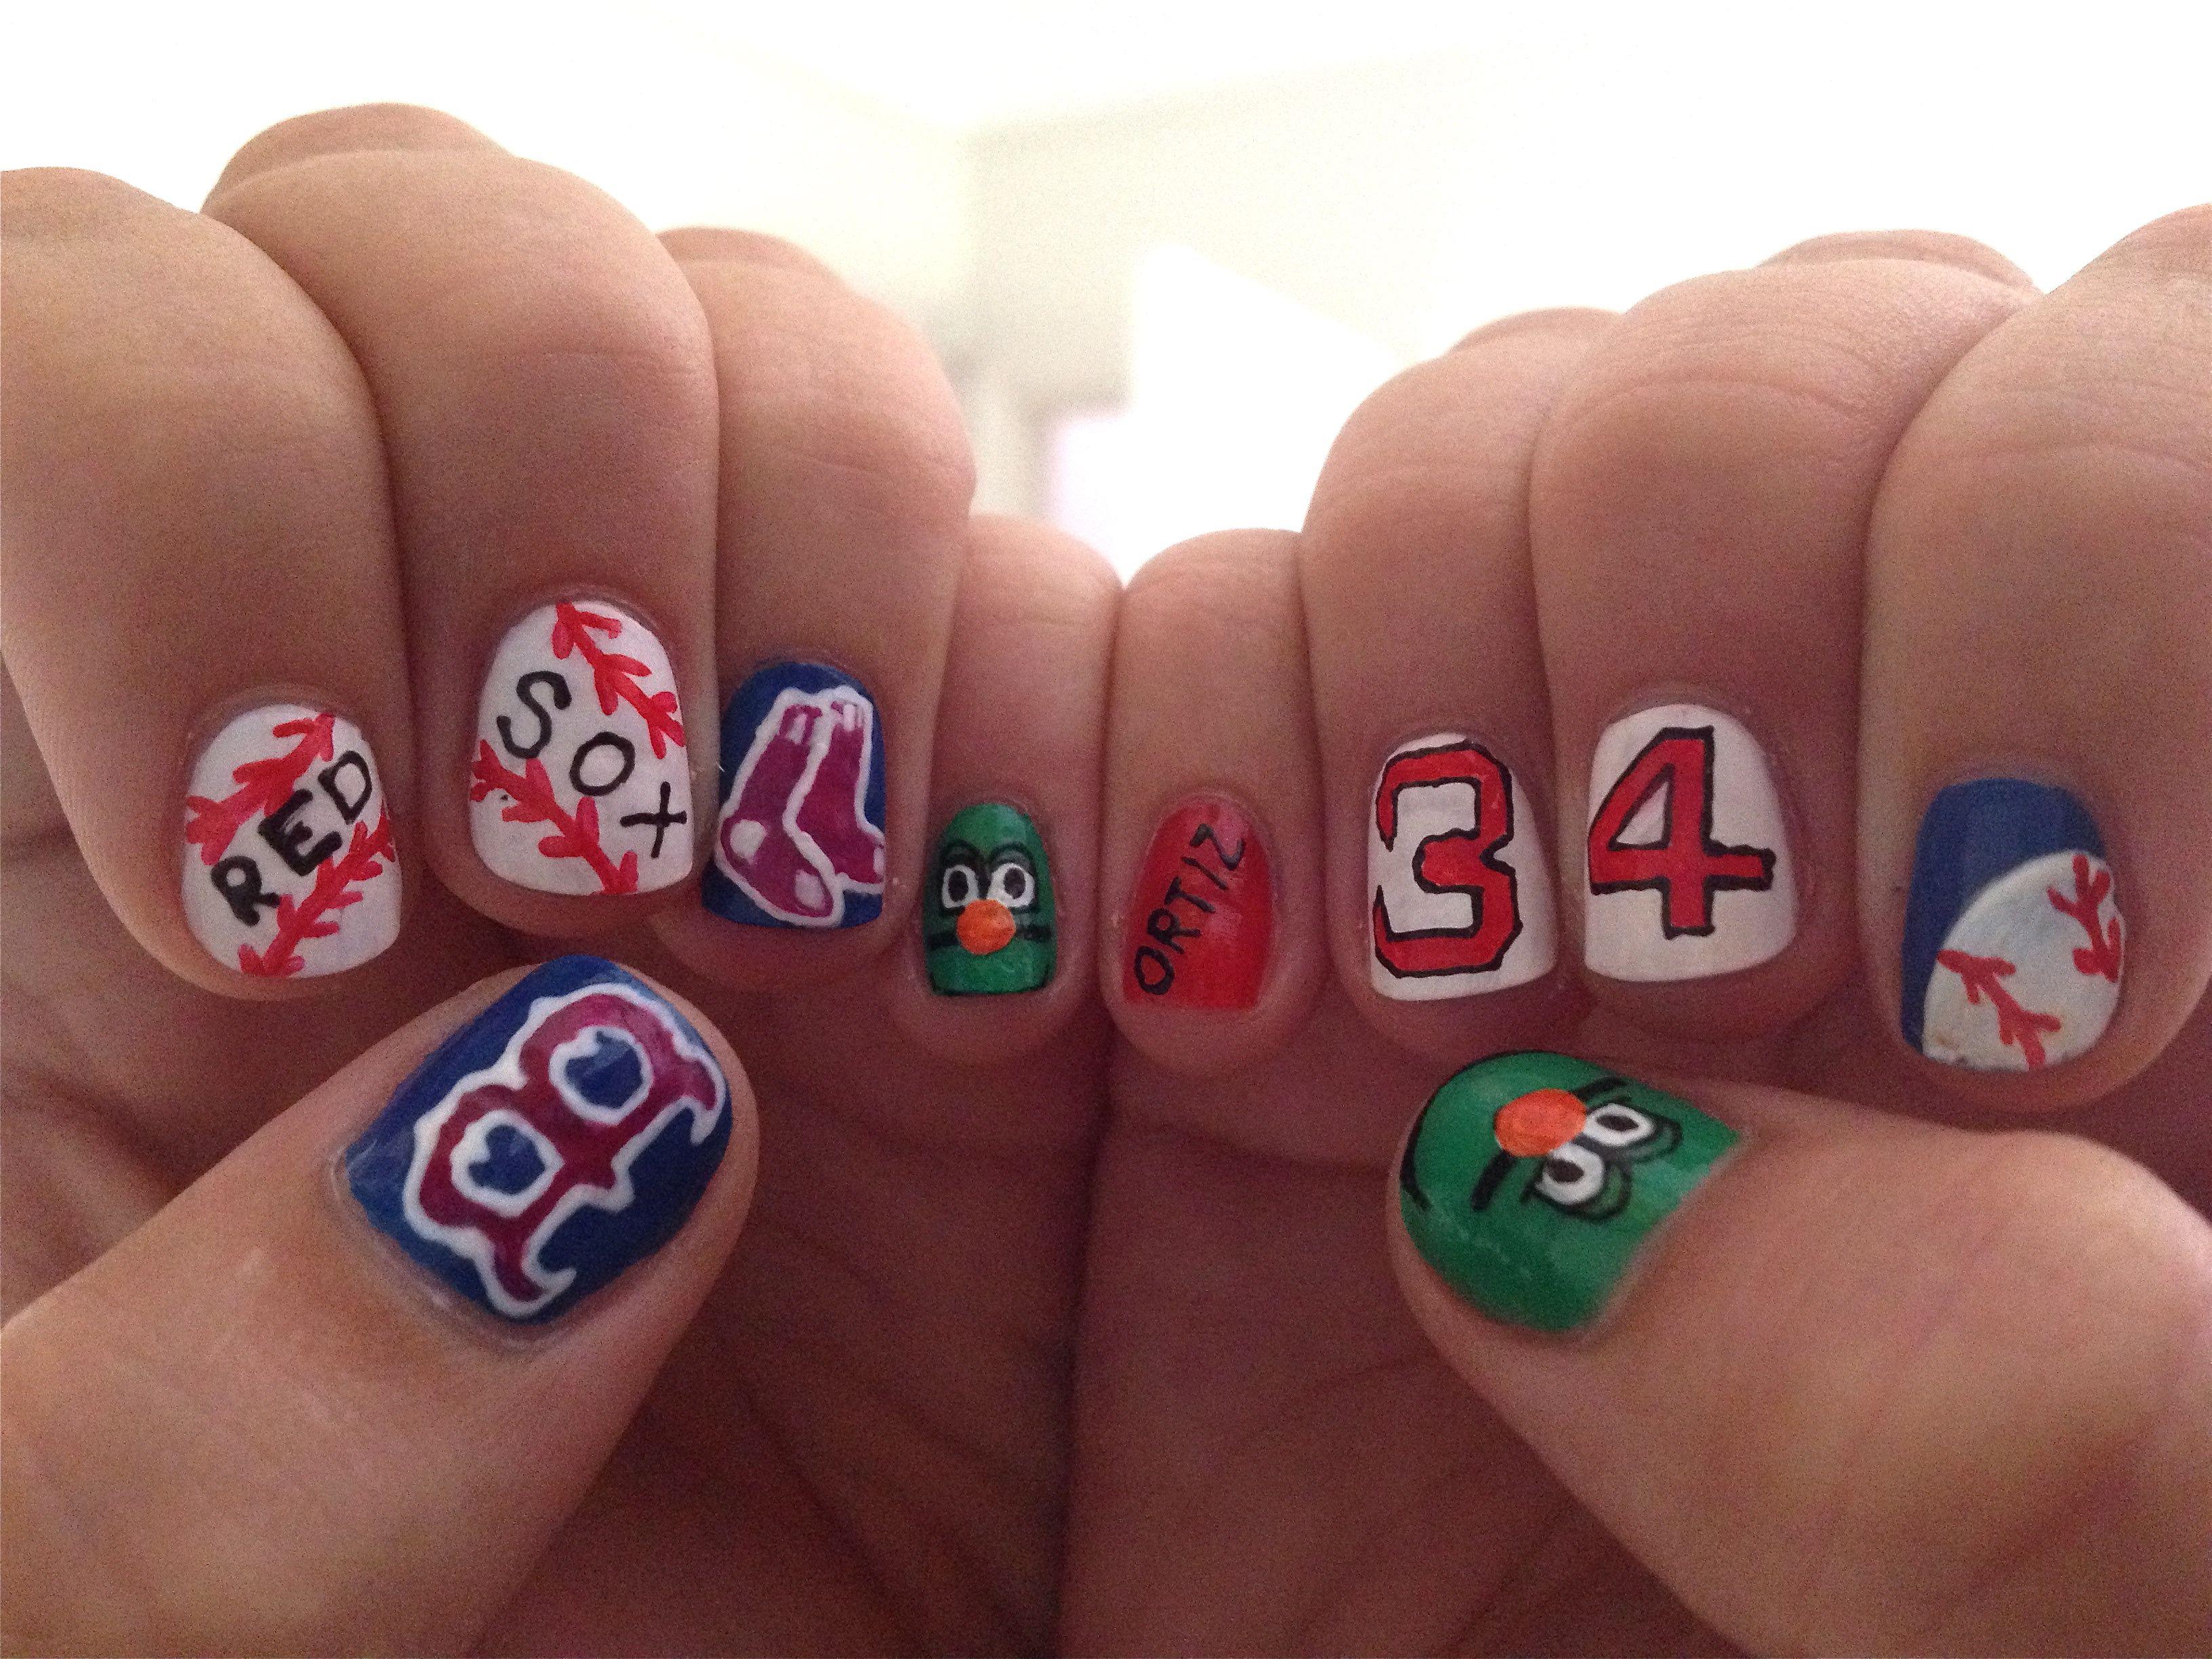 115 best nail art images on pinterest nail art pens and nail boston red sox nail art i did this morning prinsesfo Images